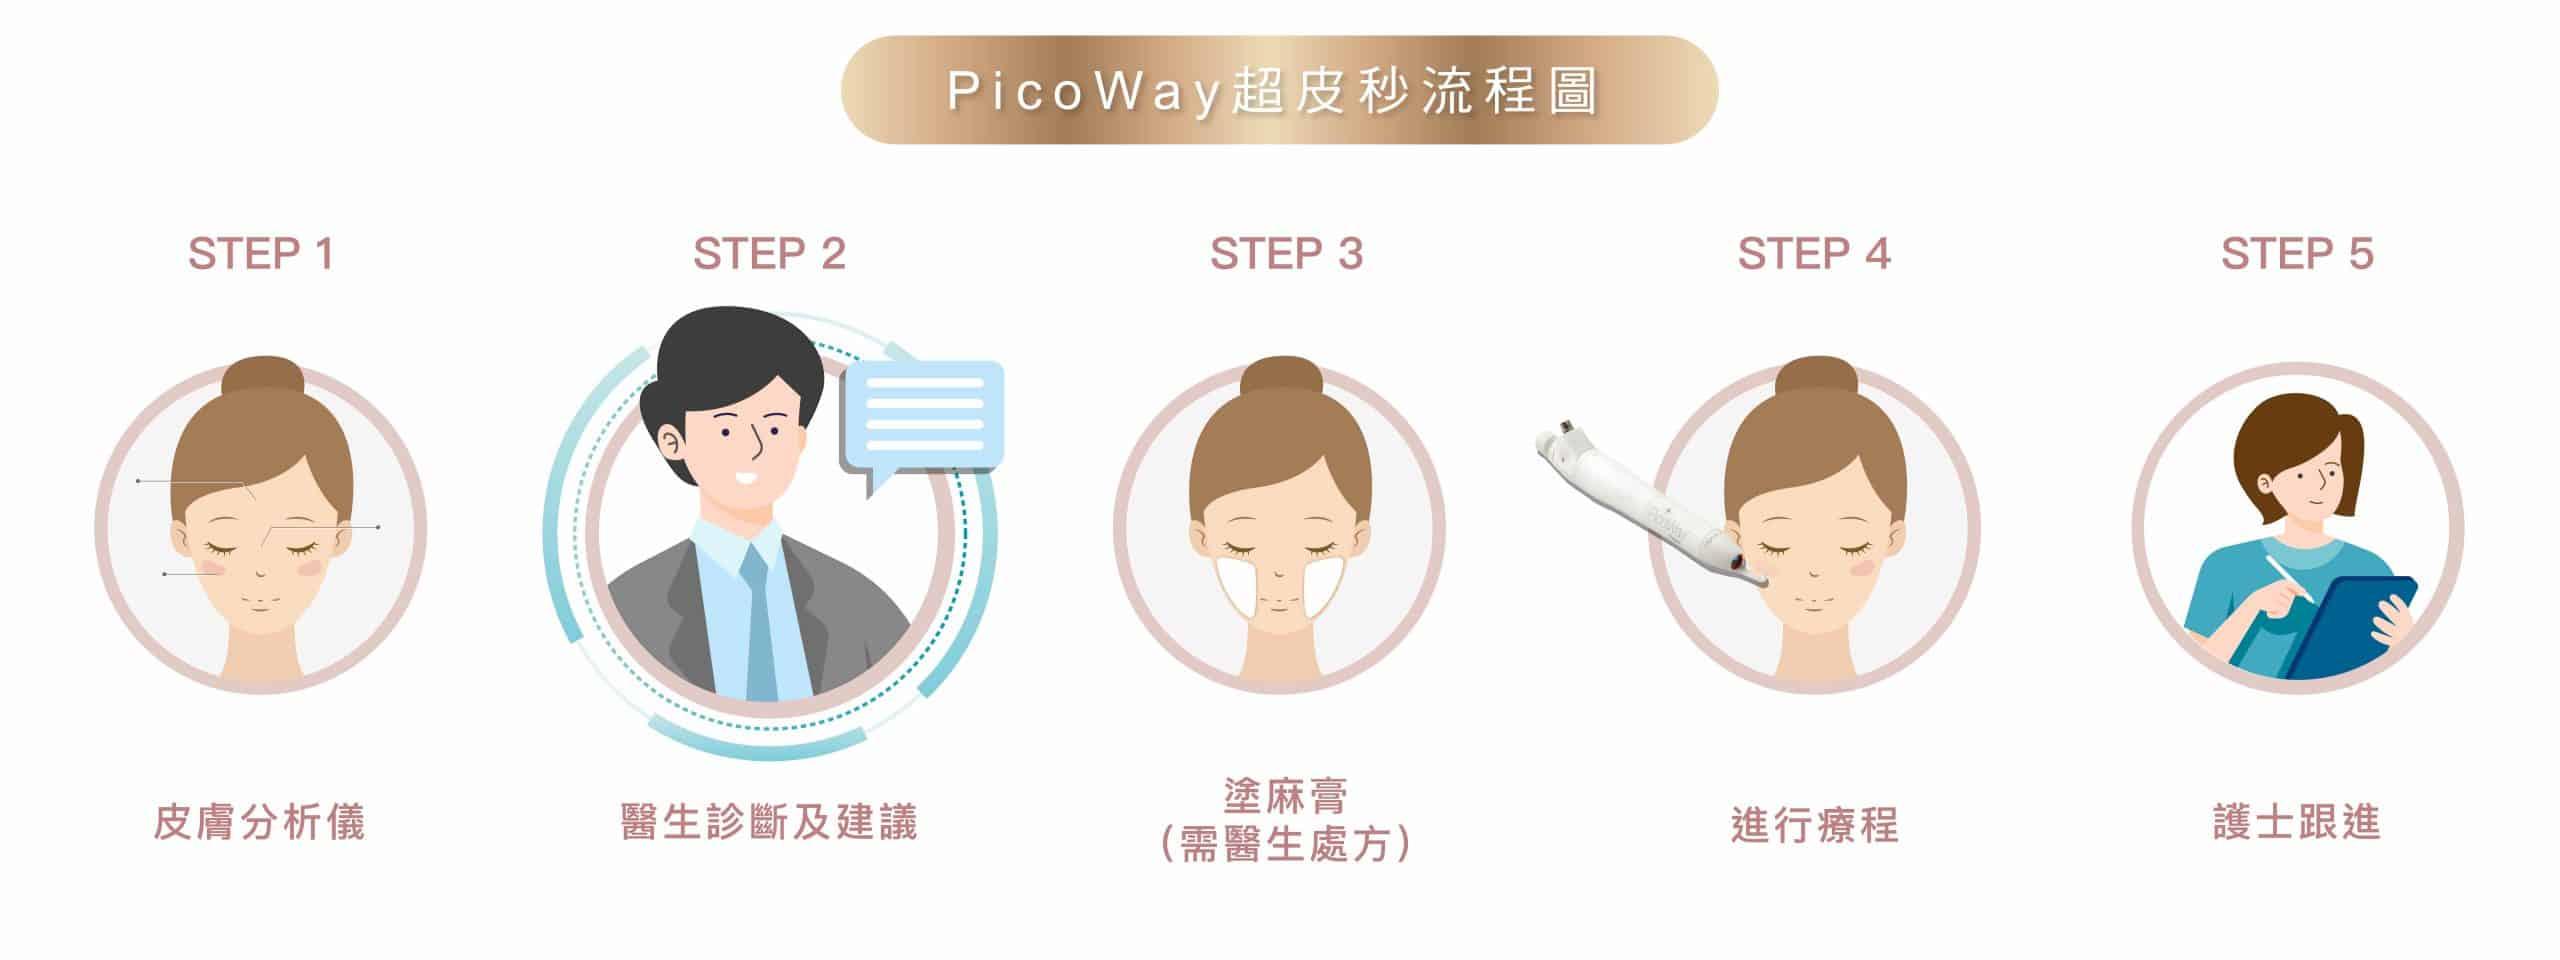 Picoway 流程 工作區域 2 scaled